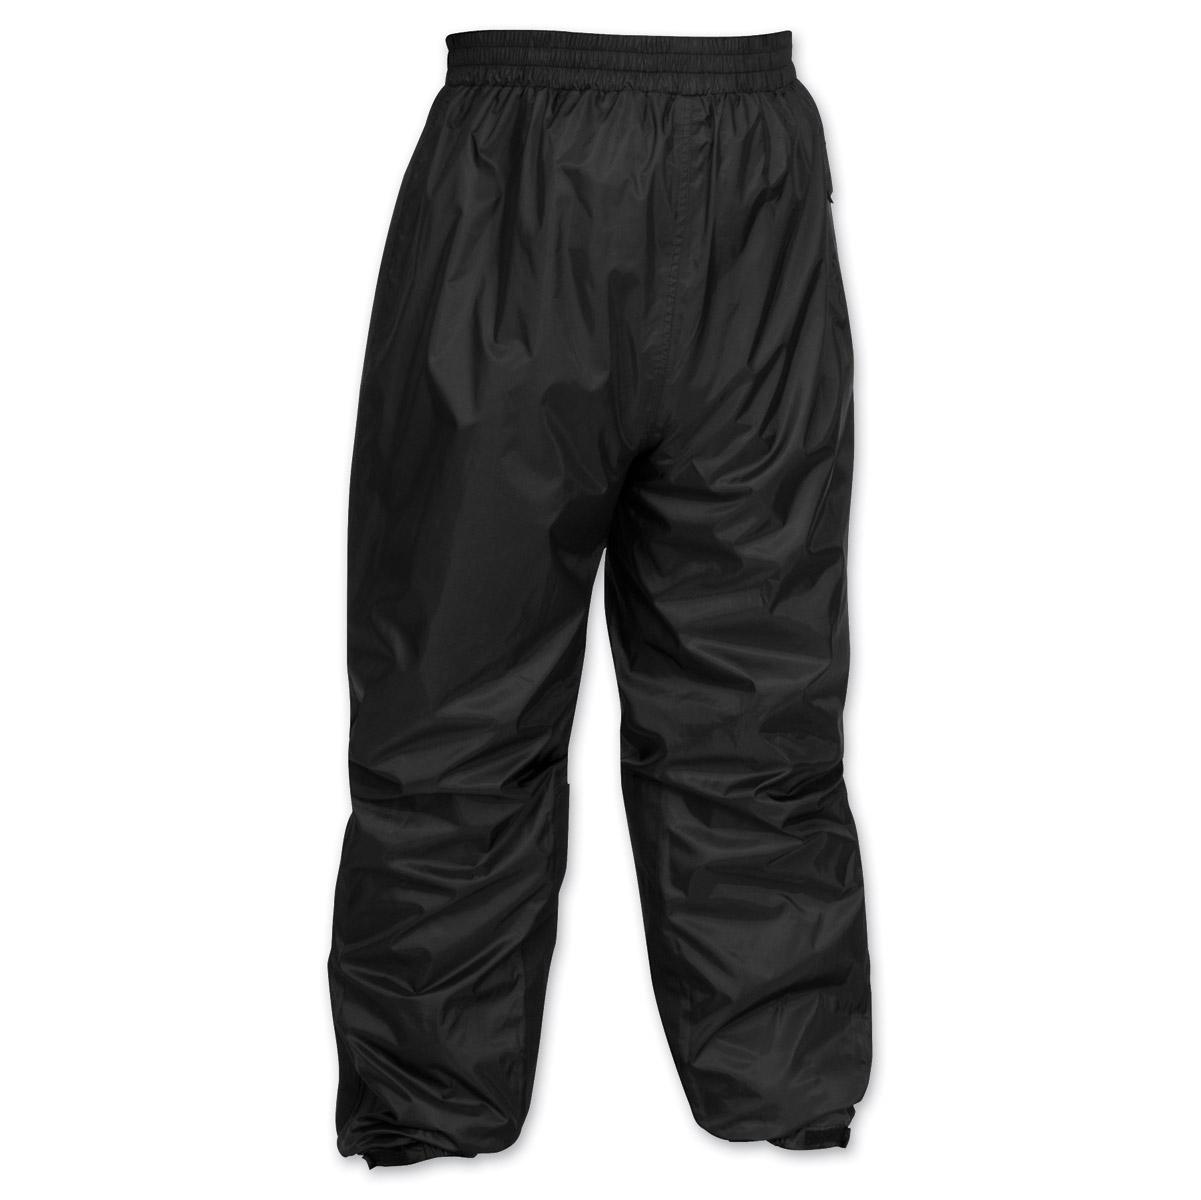 Firstgear Rainman Black Rain Pants